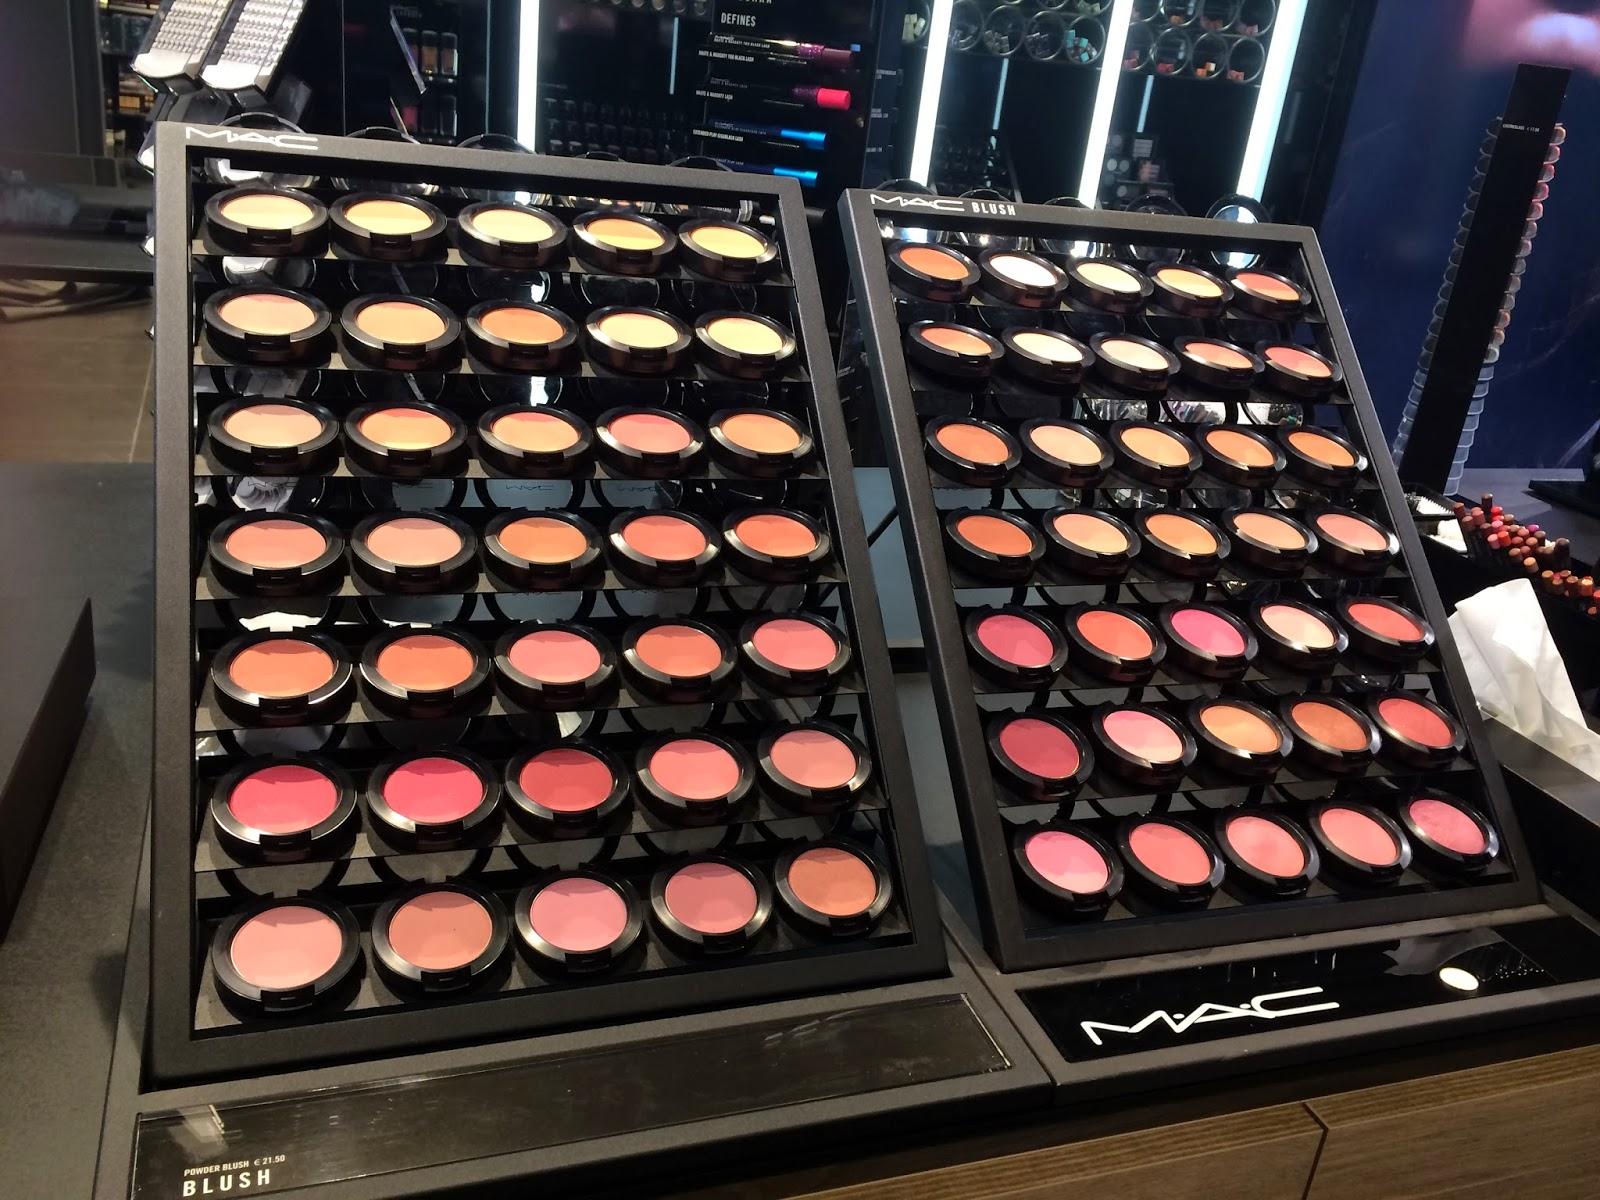 Mac blush stand